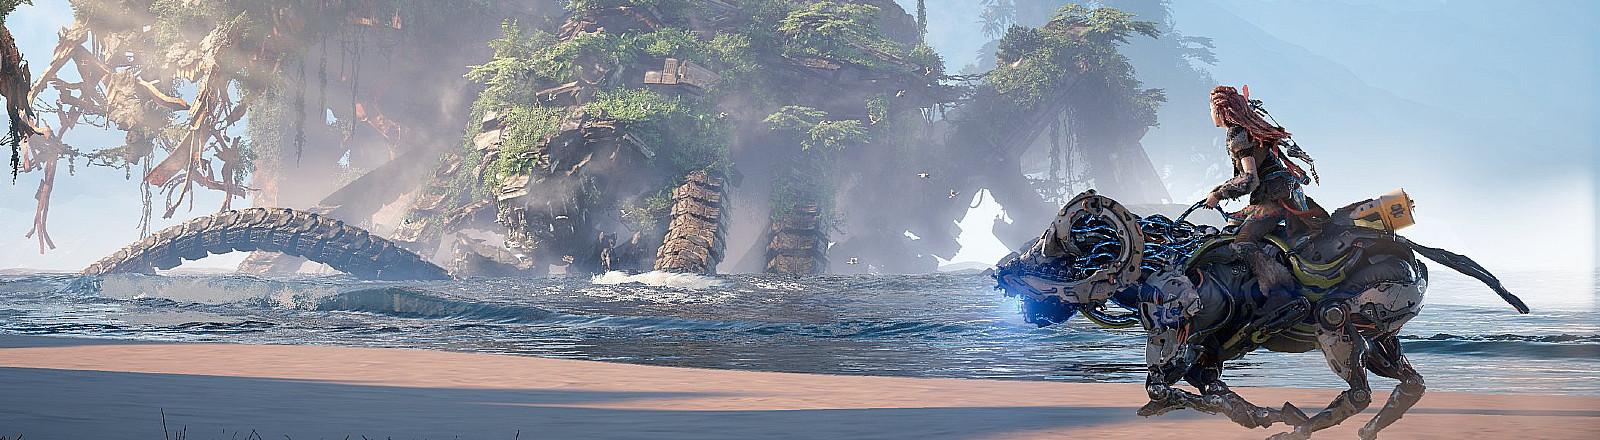 "Screenshot aus dem Game ""Horizon Forbidden West"""